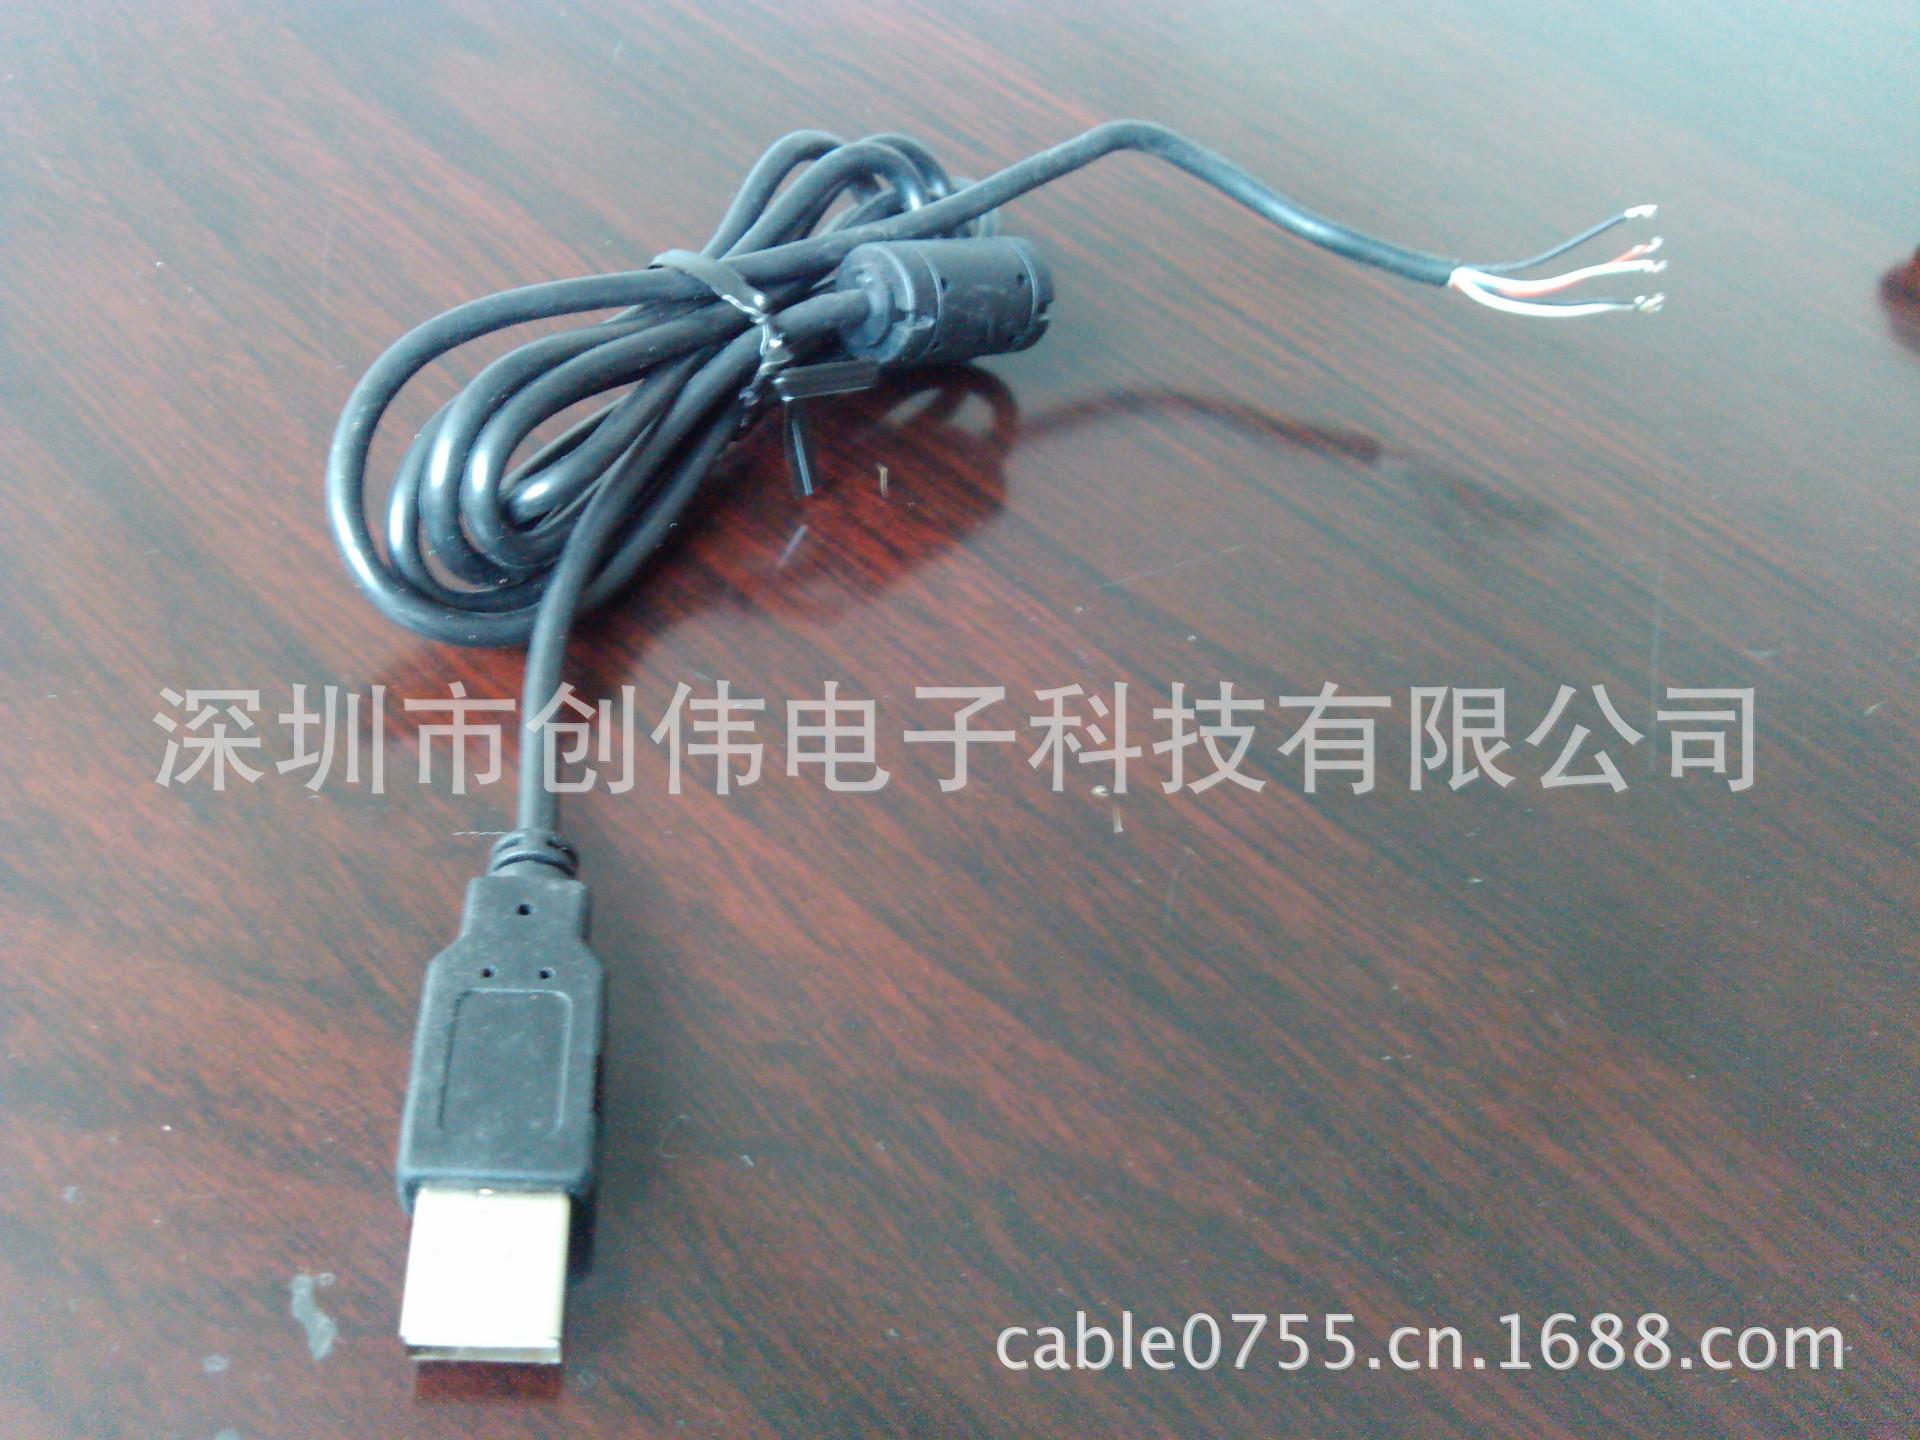 USB AM 焊接数据线 图图片